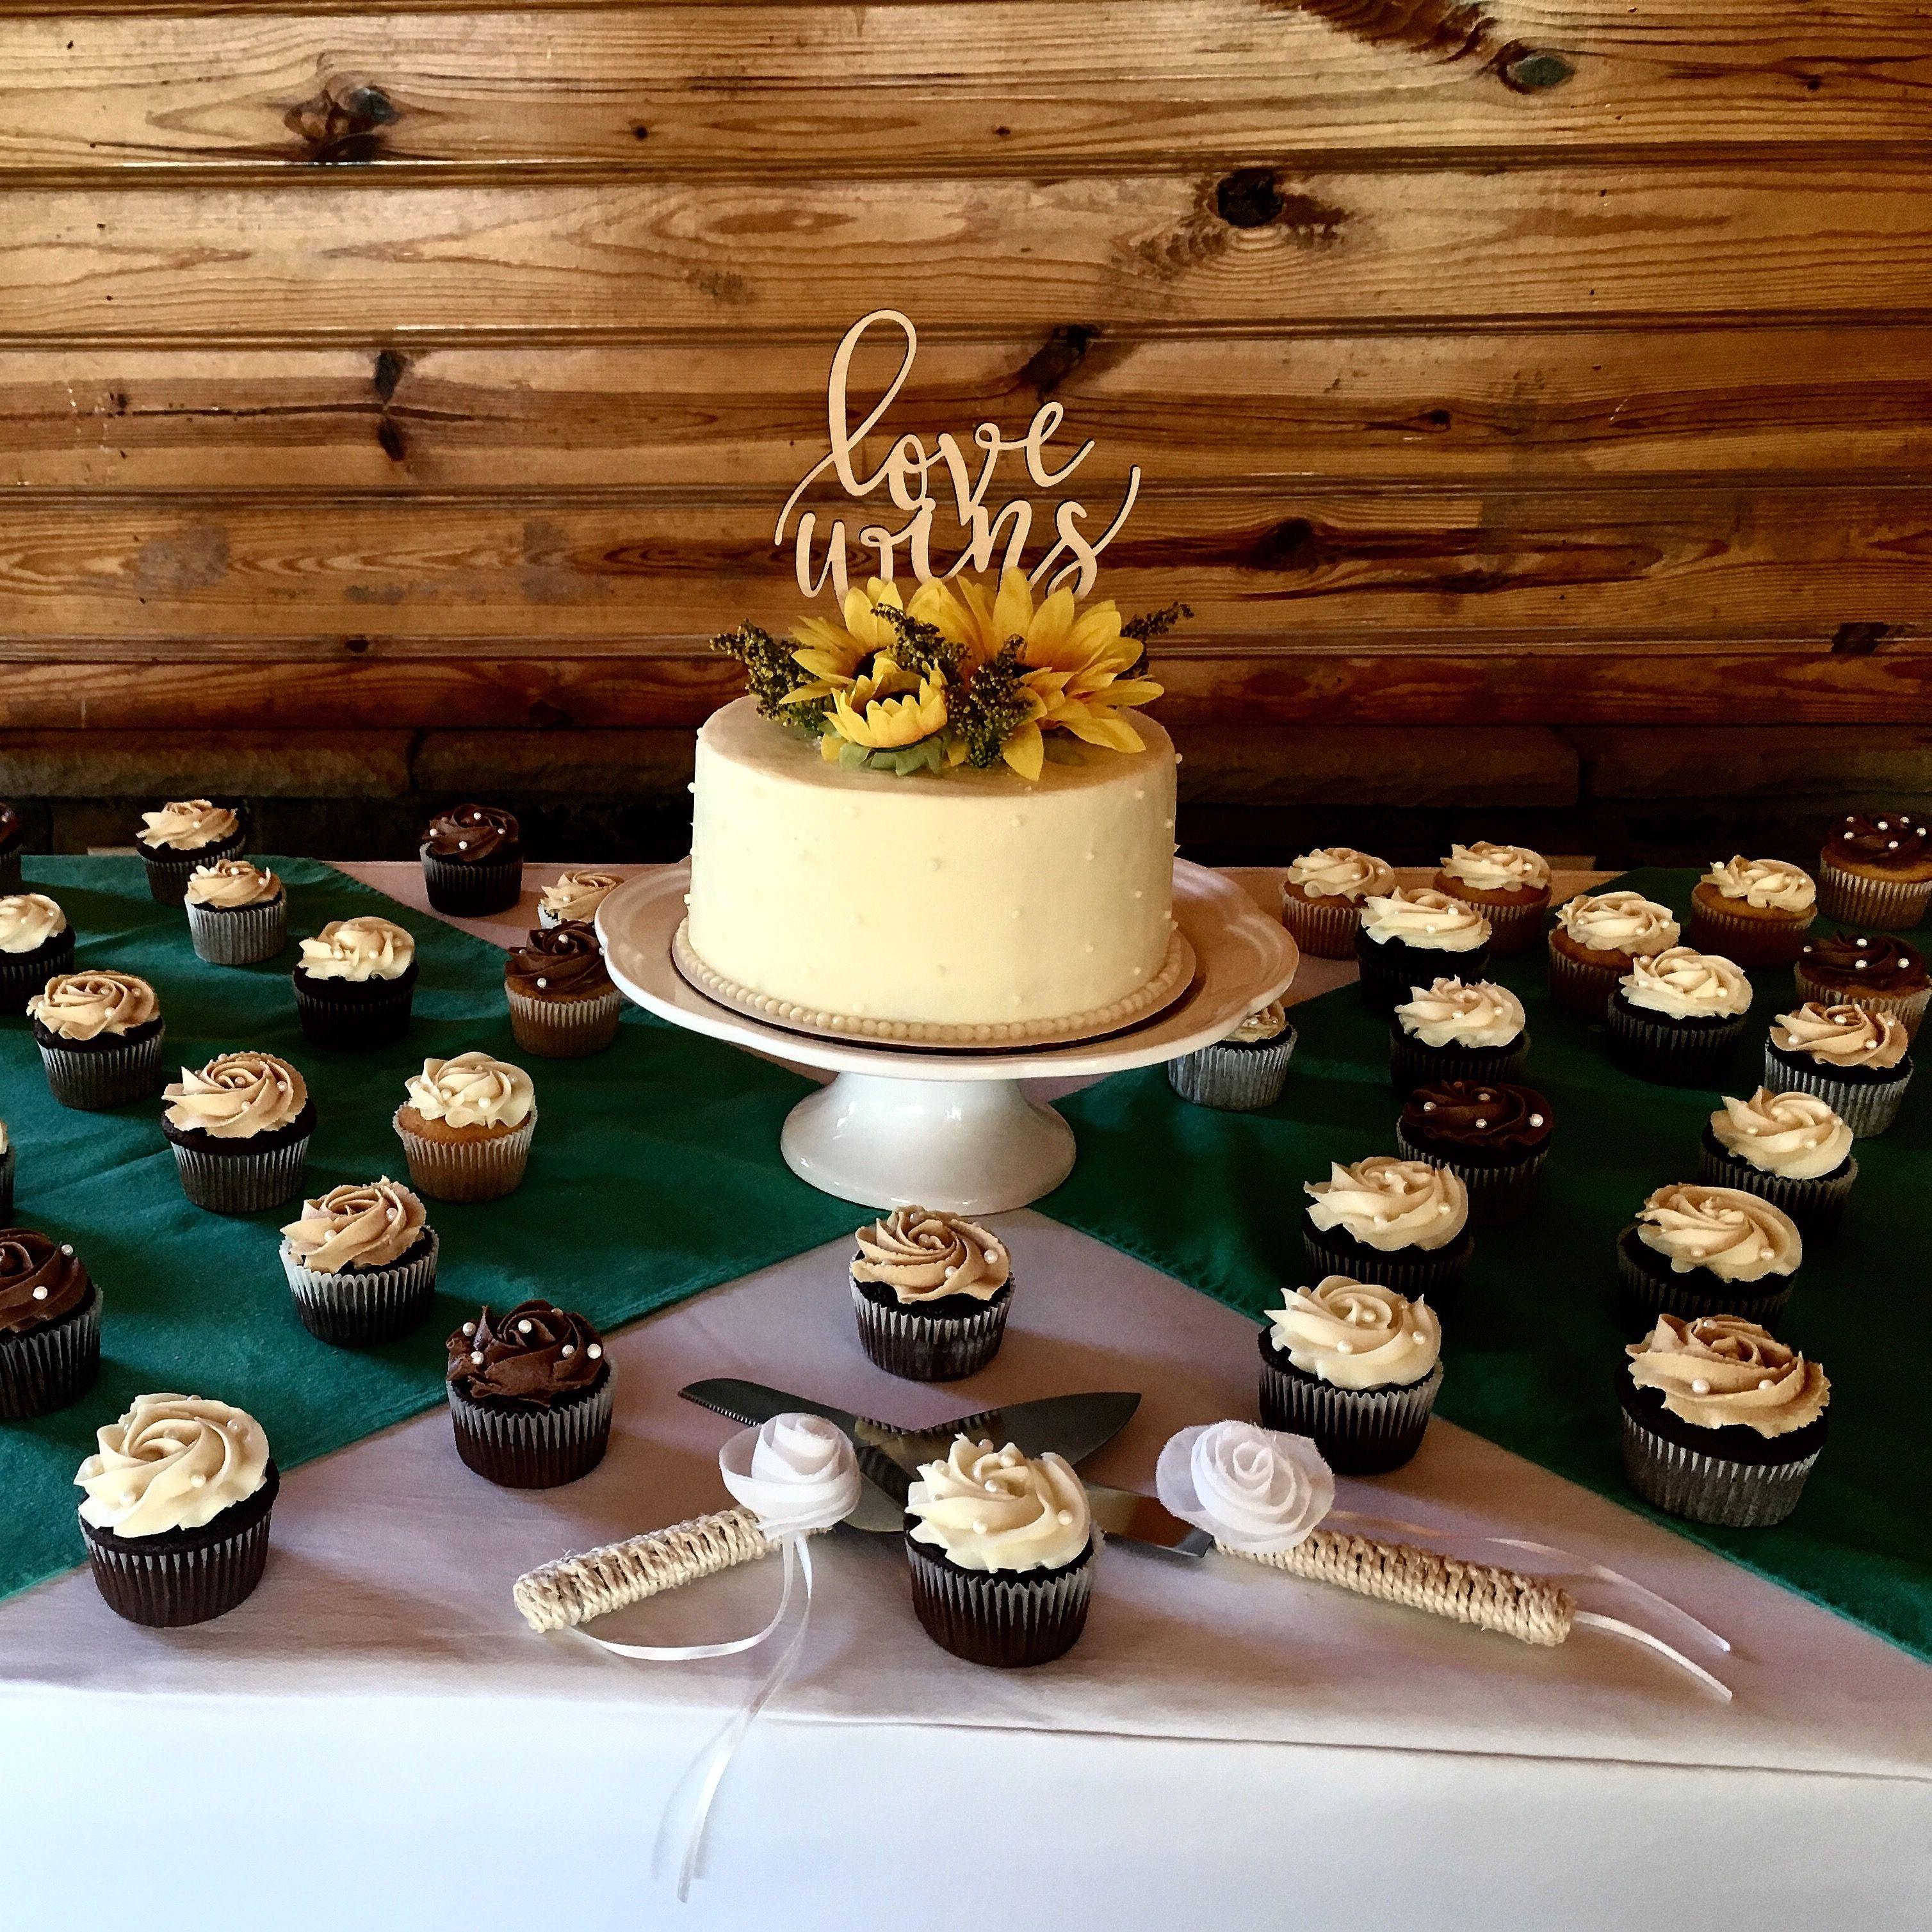 Rustic Wedding Cake And Cupcakes: Simple Rustic Wedding Cake And Cupcakes